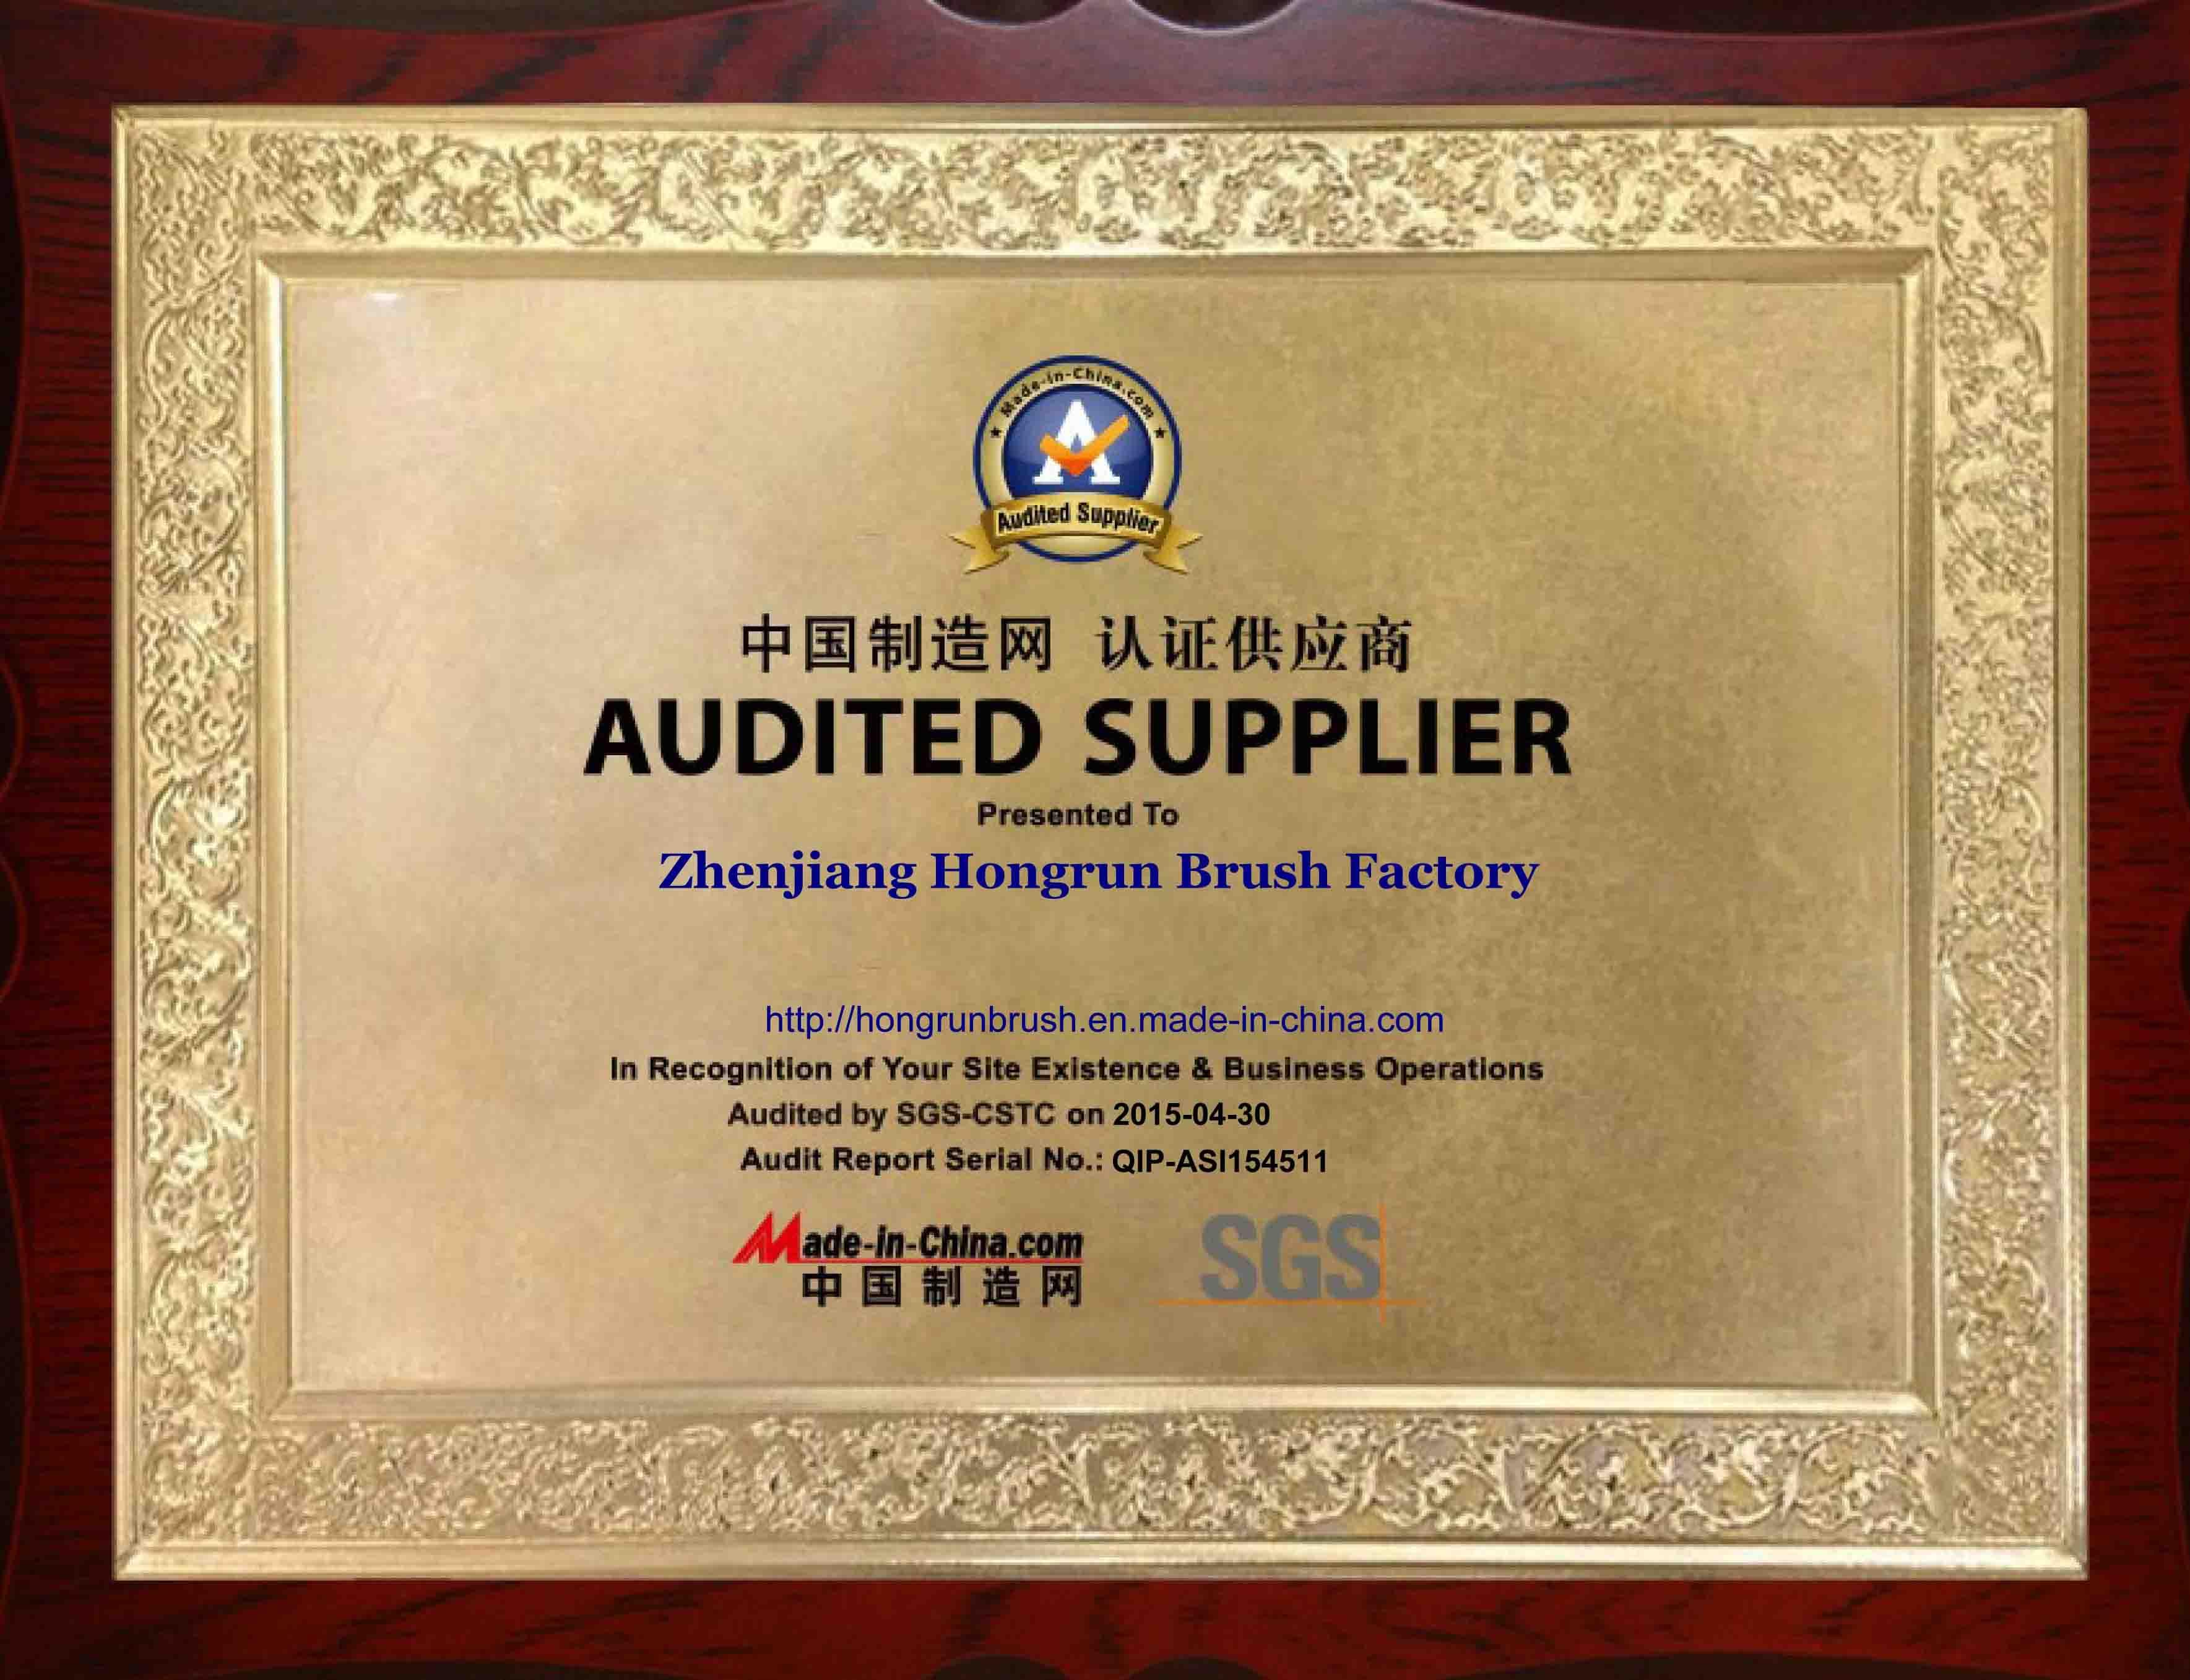 AUDITED SUPPLIER (supplier assessment report)